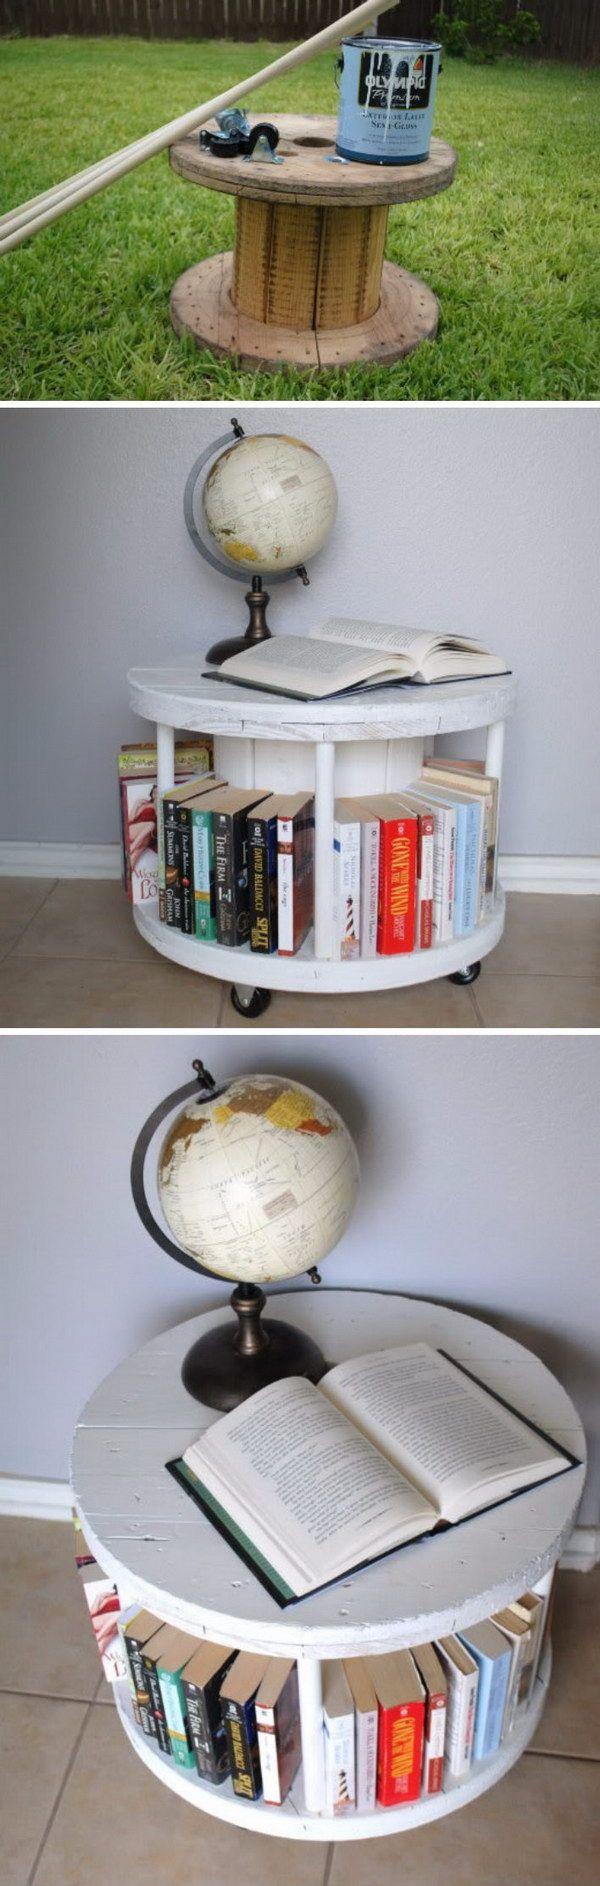 Easy Diy Spool Bookcase